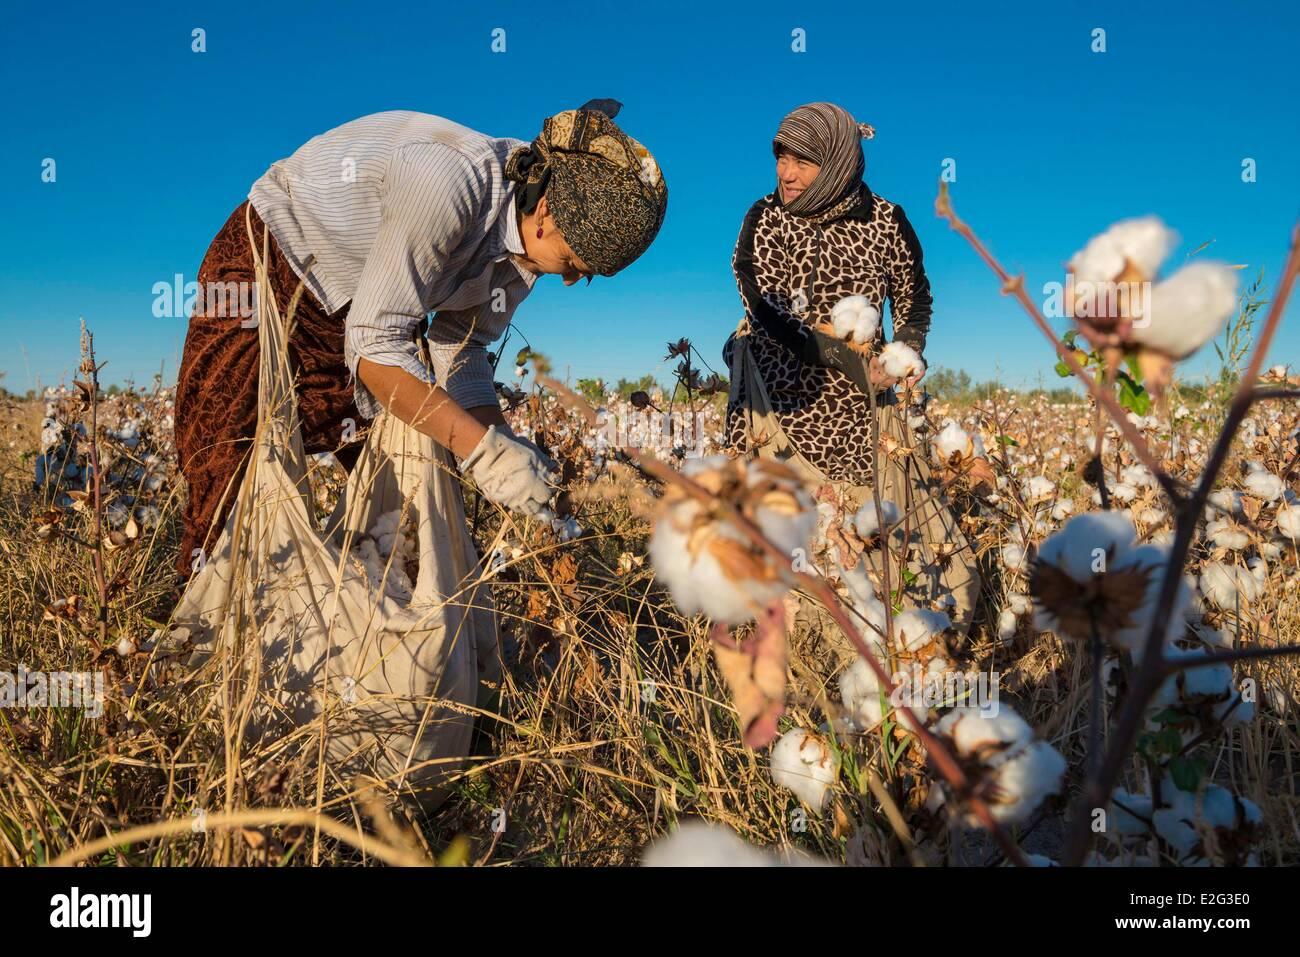 La ruta de la Seda Uzbekistán Khorezm Provincia Mujeres recolectando algodón (Gossypium sp.) Imagen De Stock